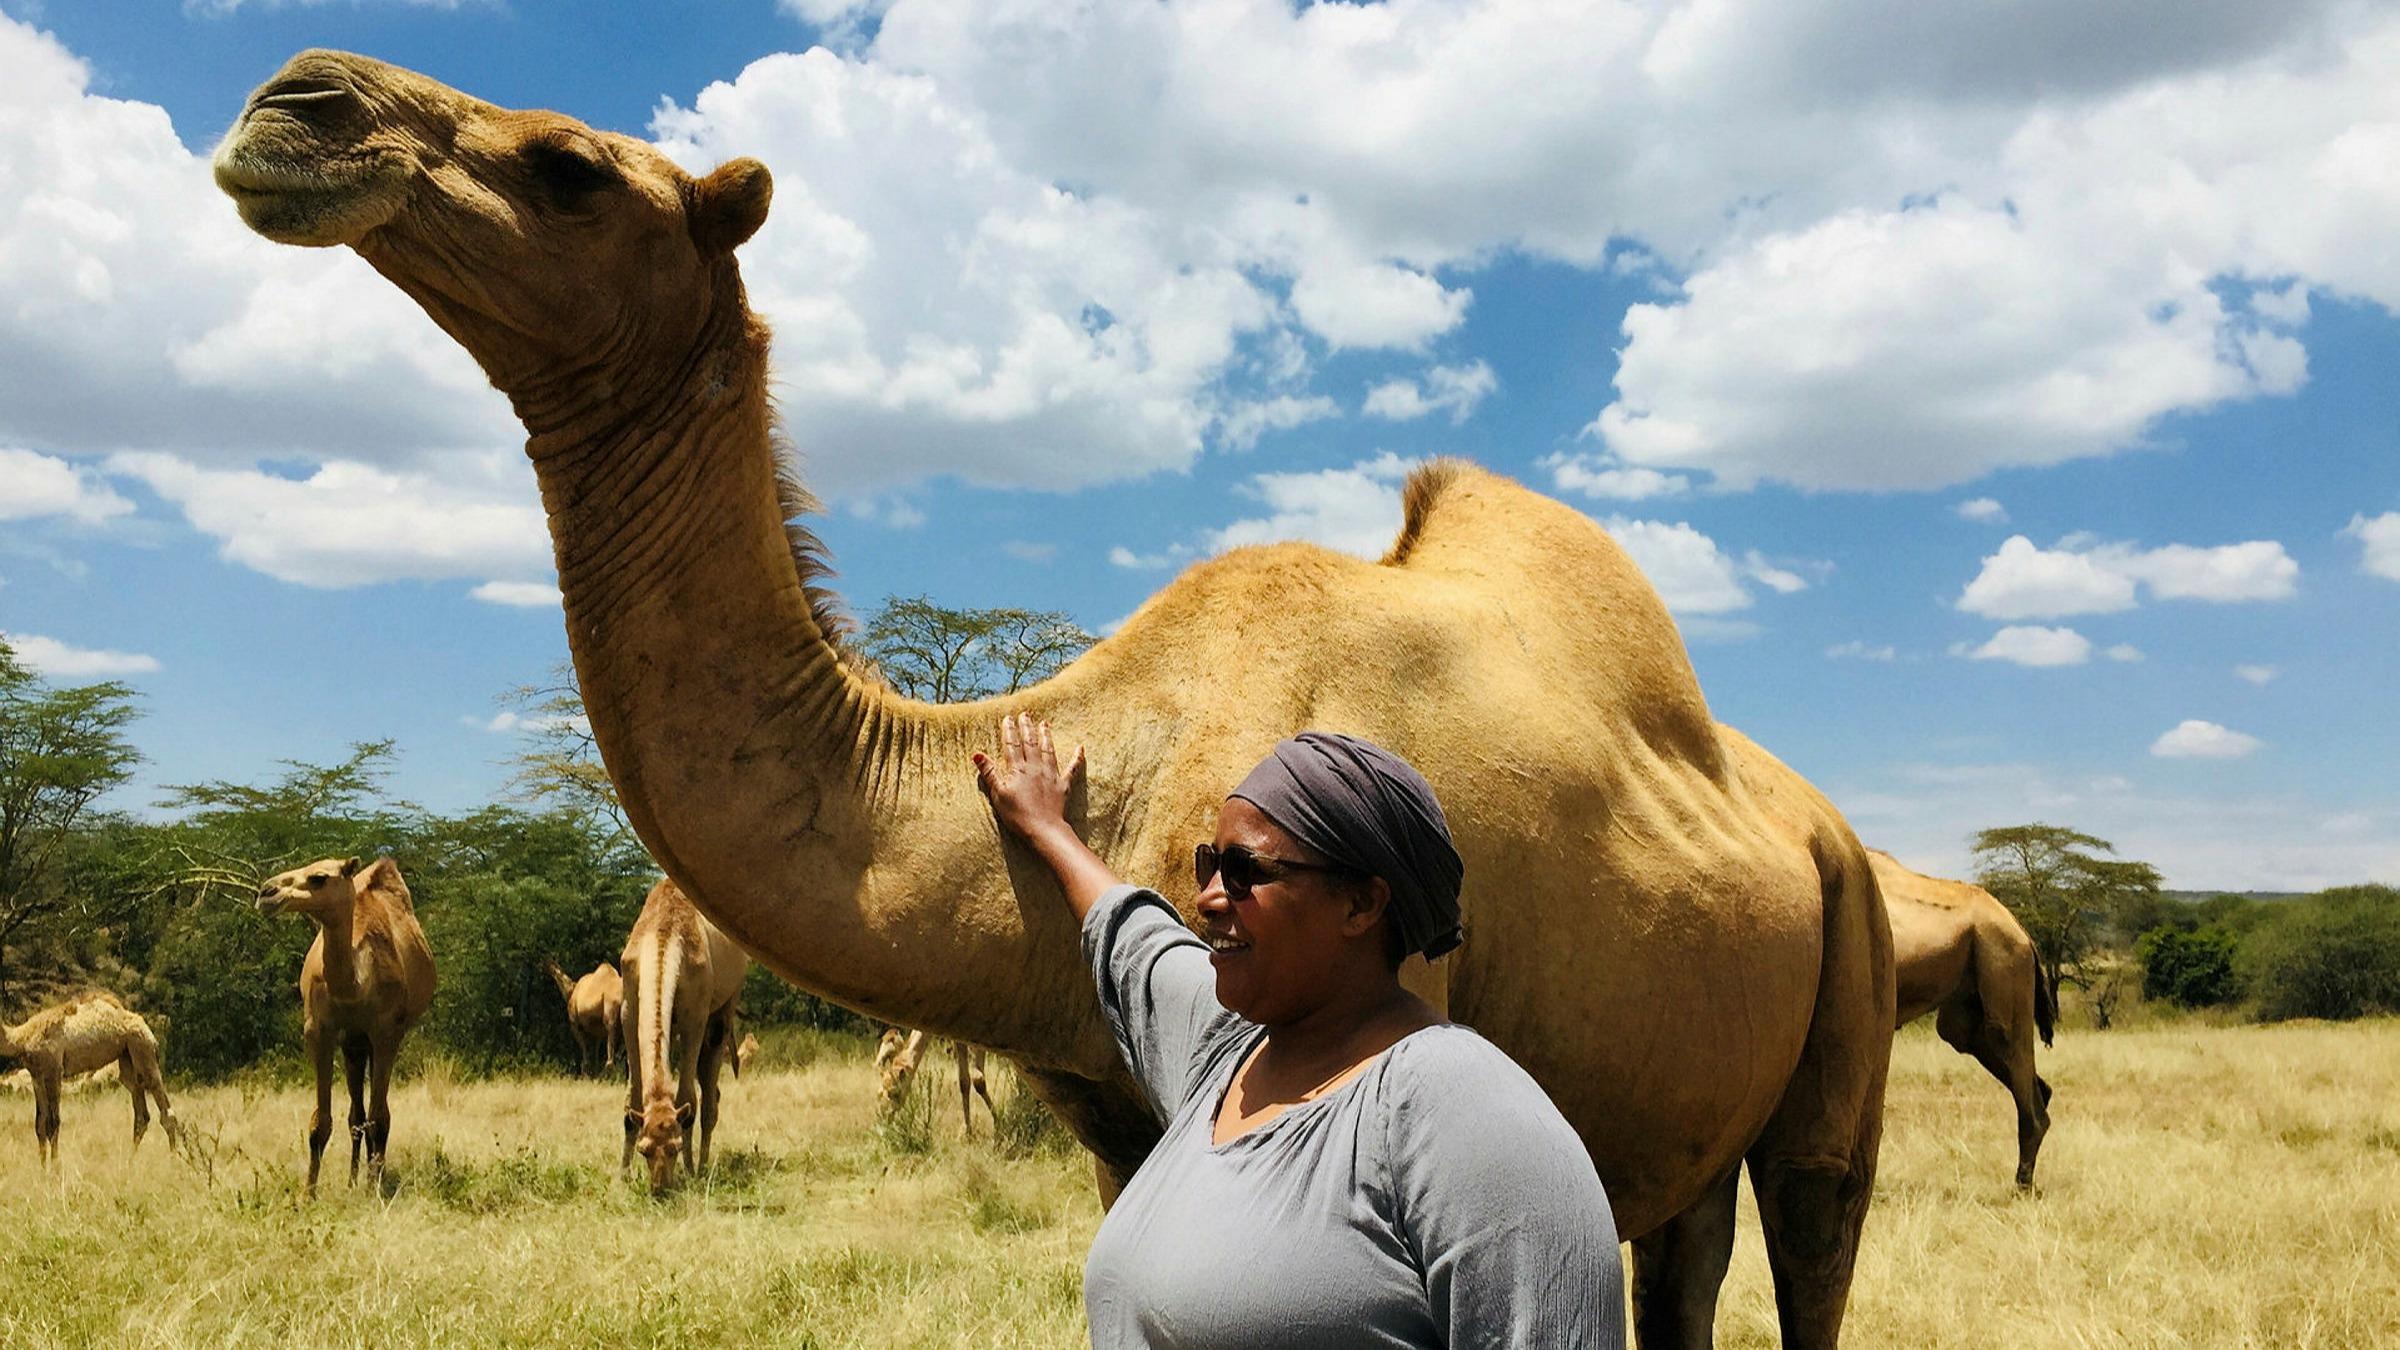 Camel Camel Manufacturing